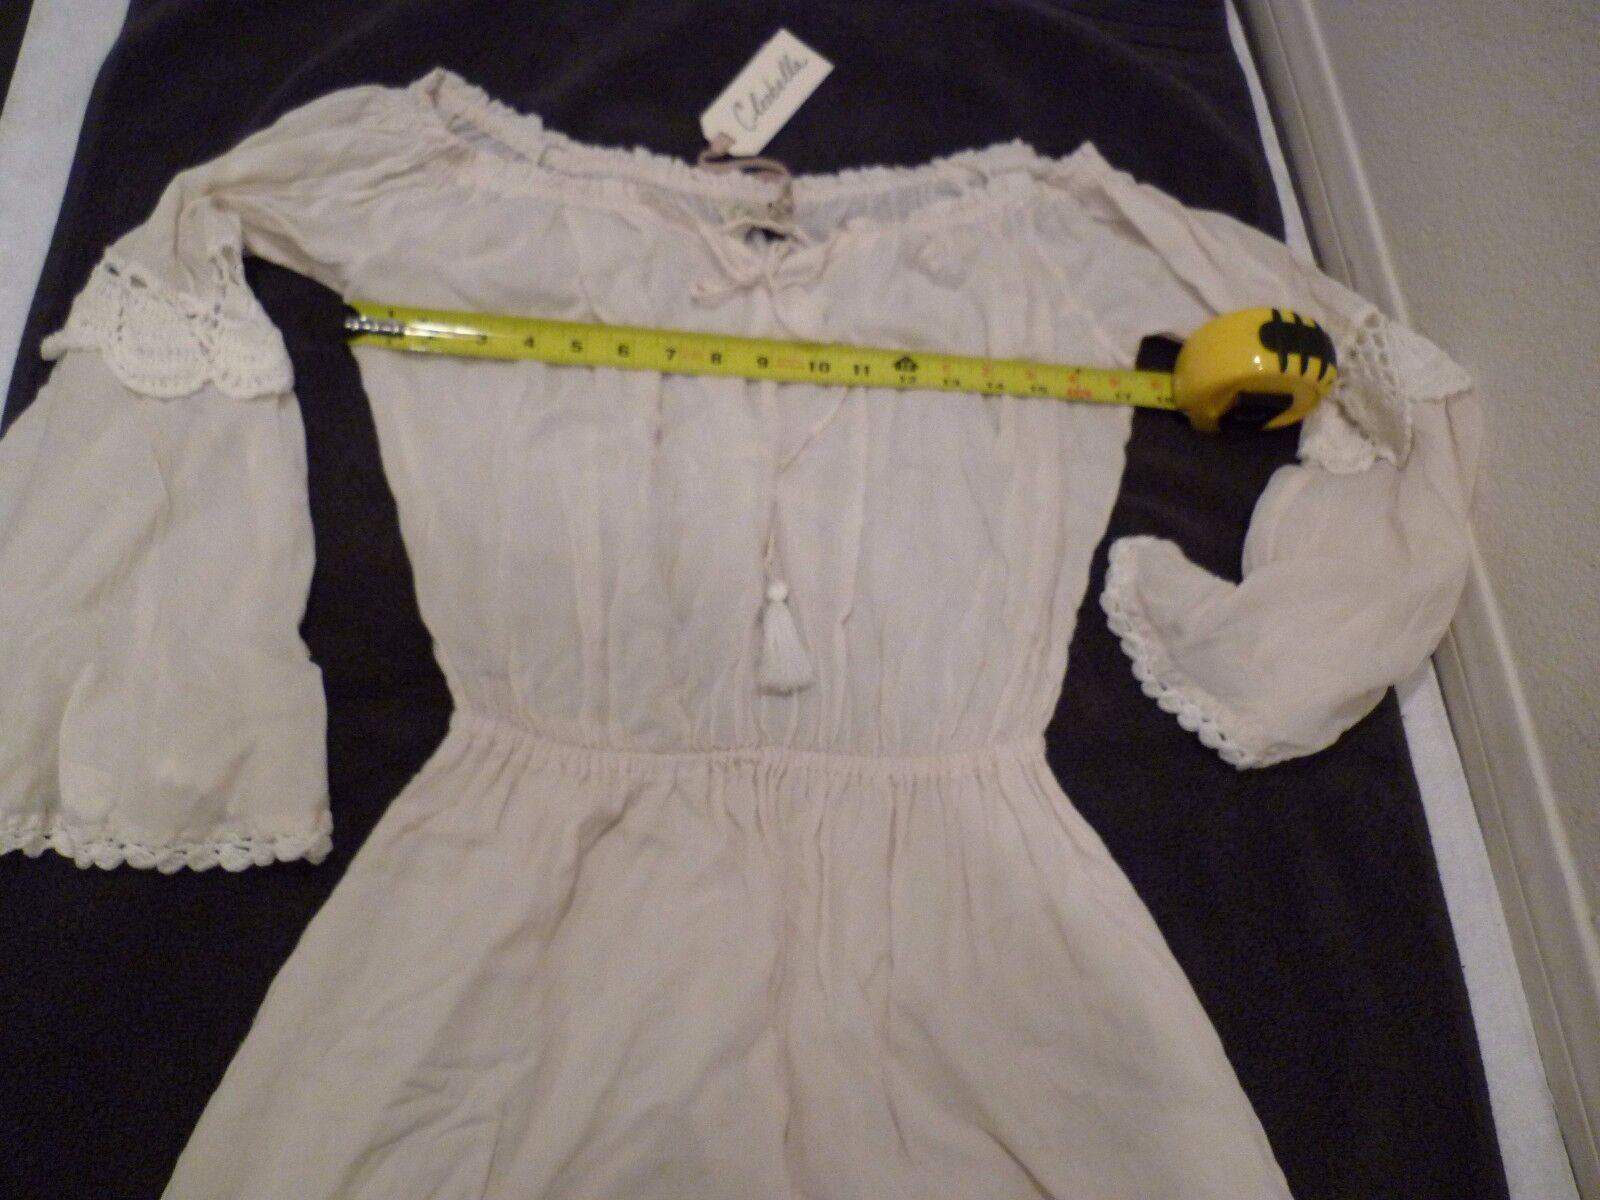 CLEOBELLA DESIGNER embroidered dress ivory bell bell bell sleeves off shoulder SZ S-NWT ac2bc3